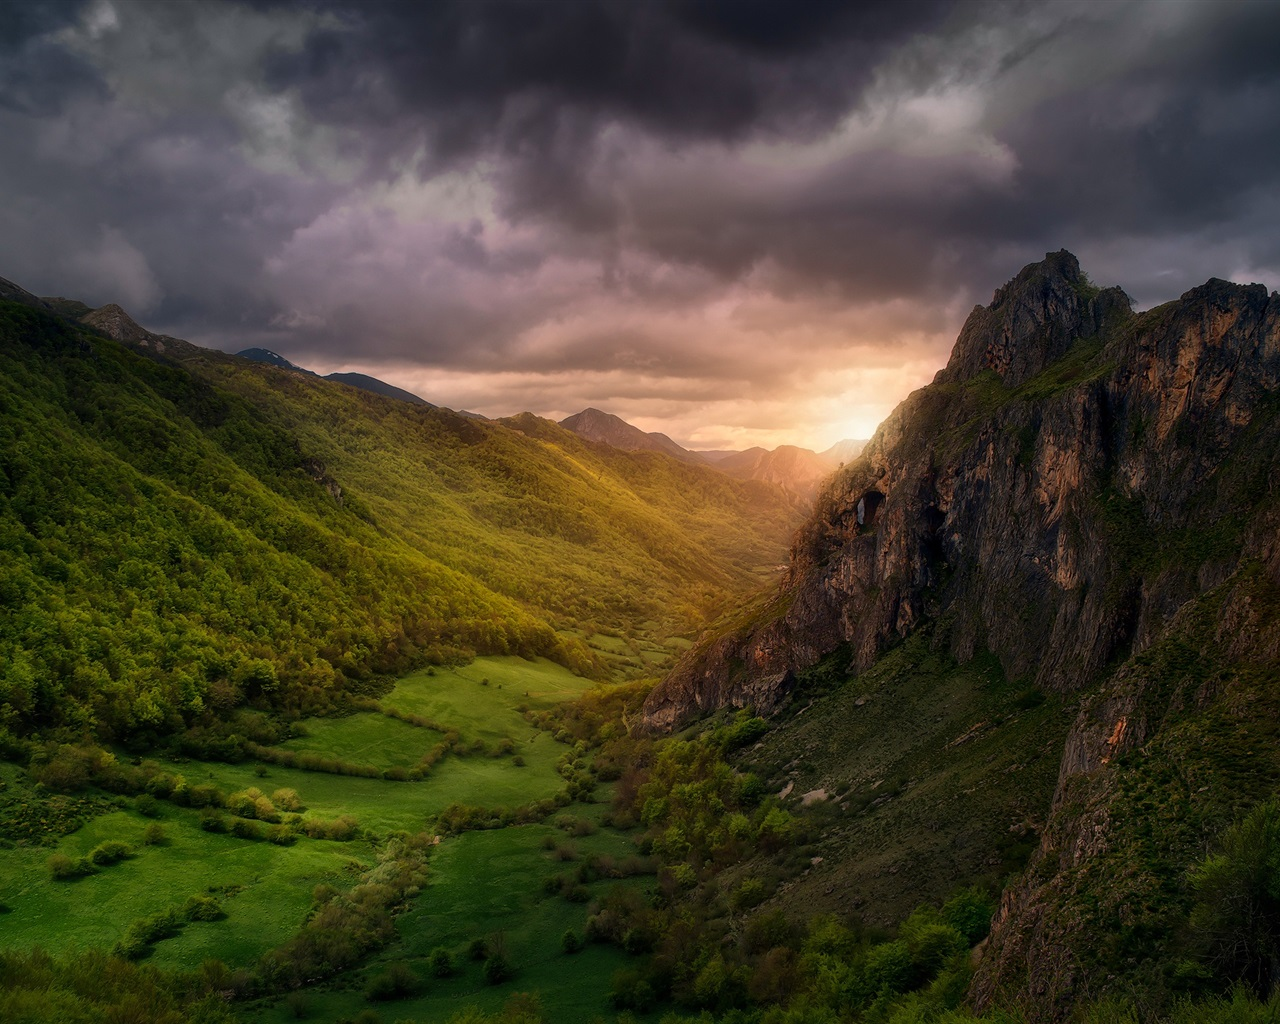 Paisaje de naturaleza hermosa nubes valle monta as for Naturaleza hermosa